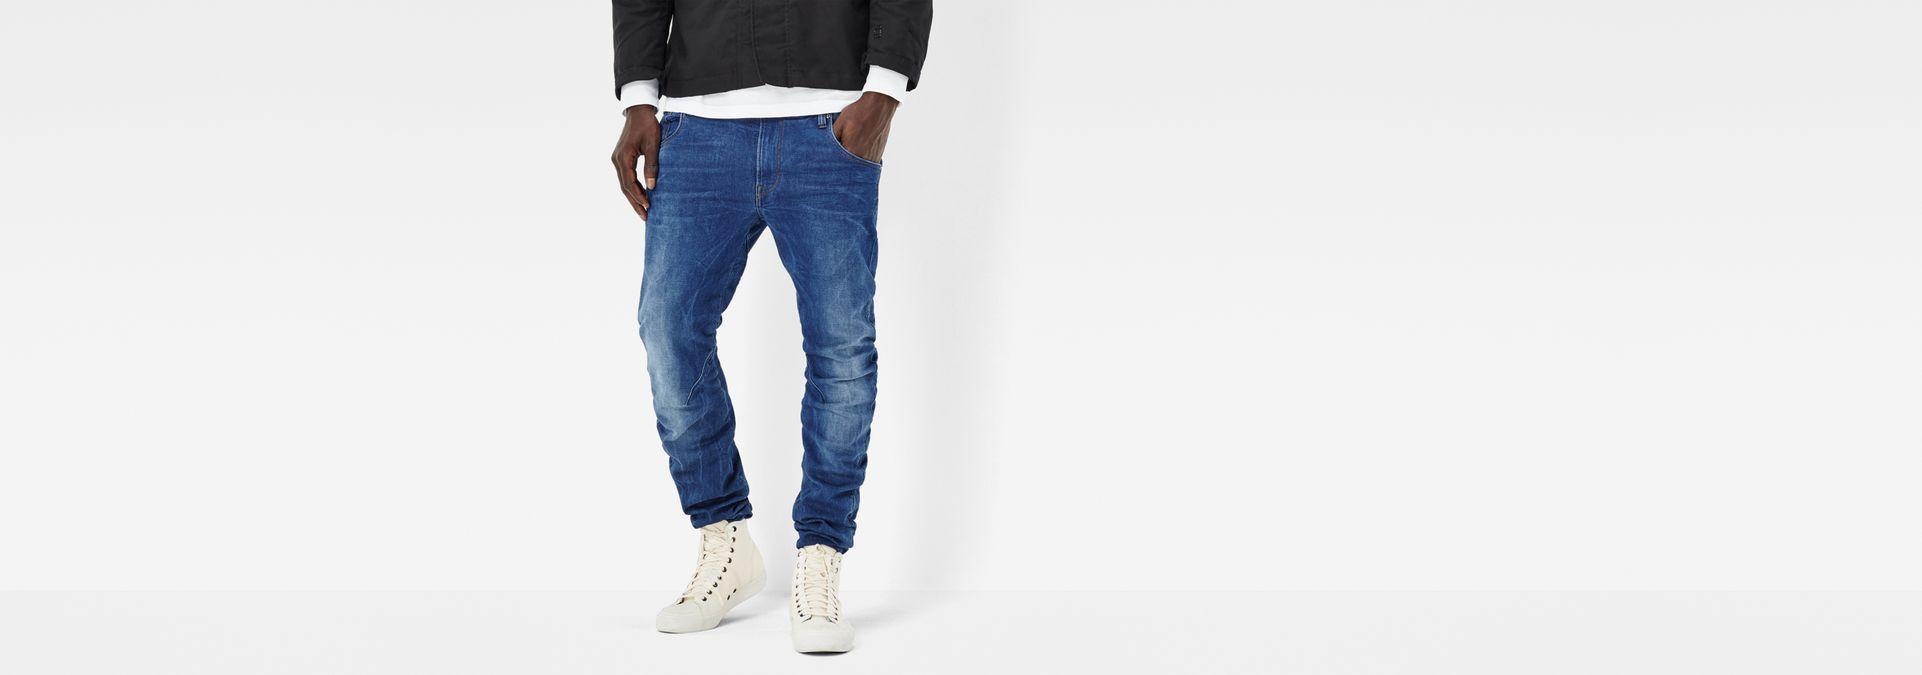 358964c9204 G-Star RAW® Arc 3D Sport Tapered Pants Medium blue model front ...